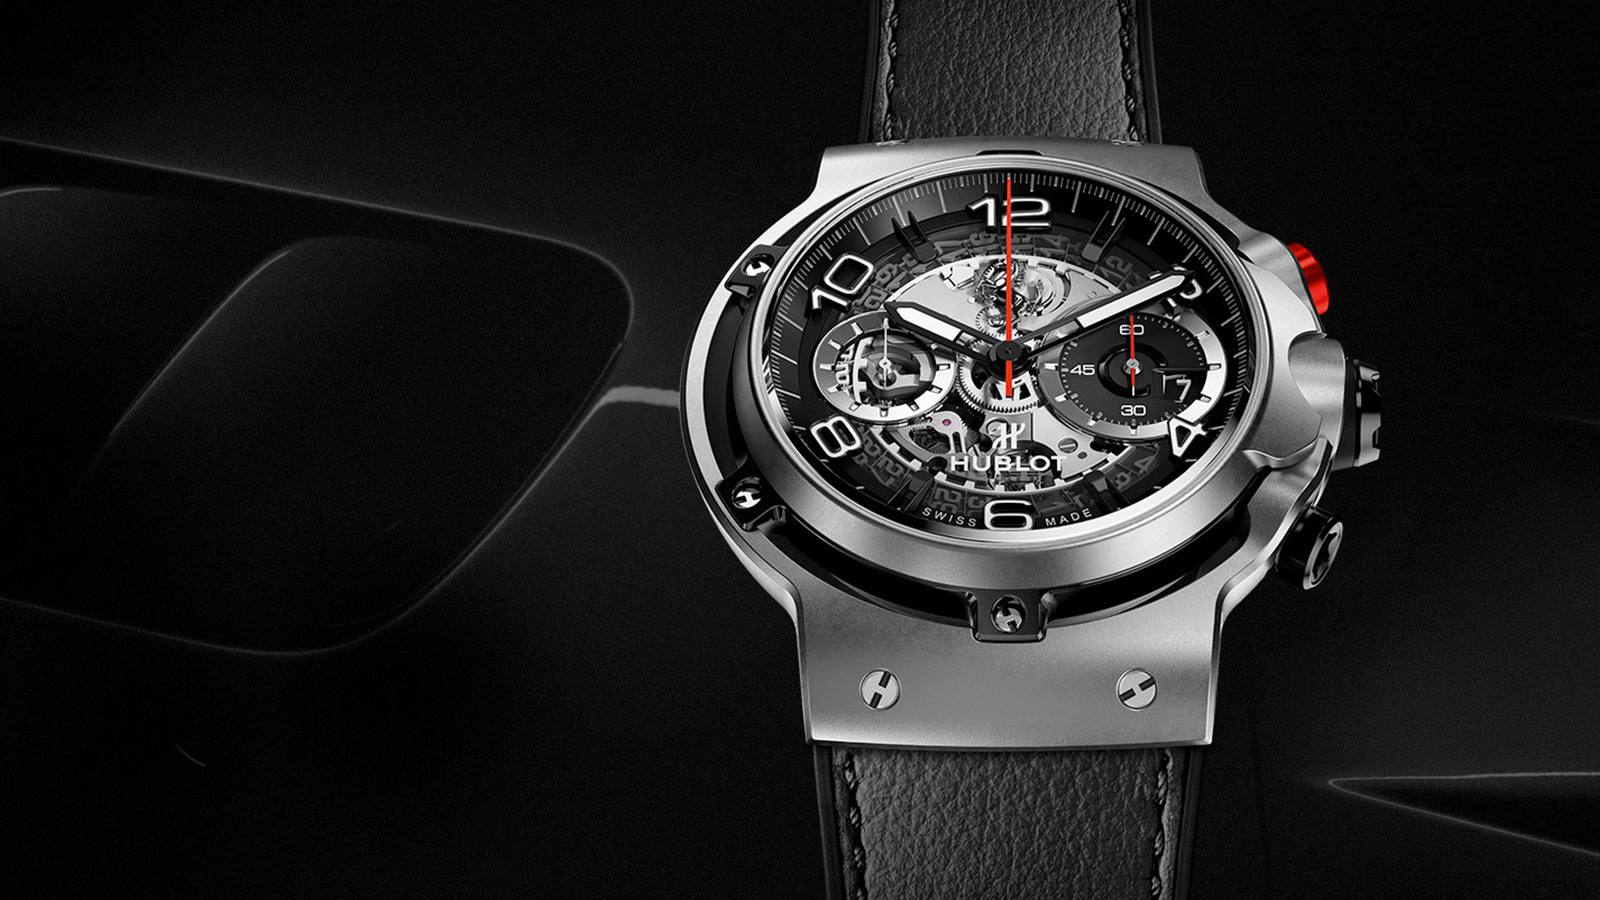 Hublot Classic Fusion Ferrari GT Watch